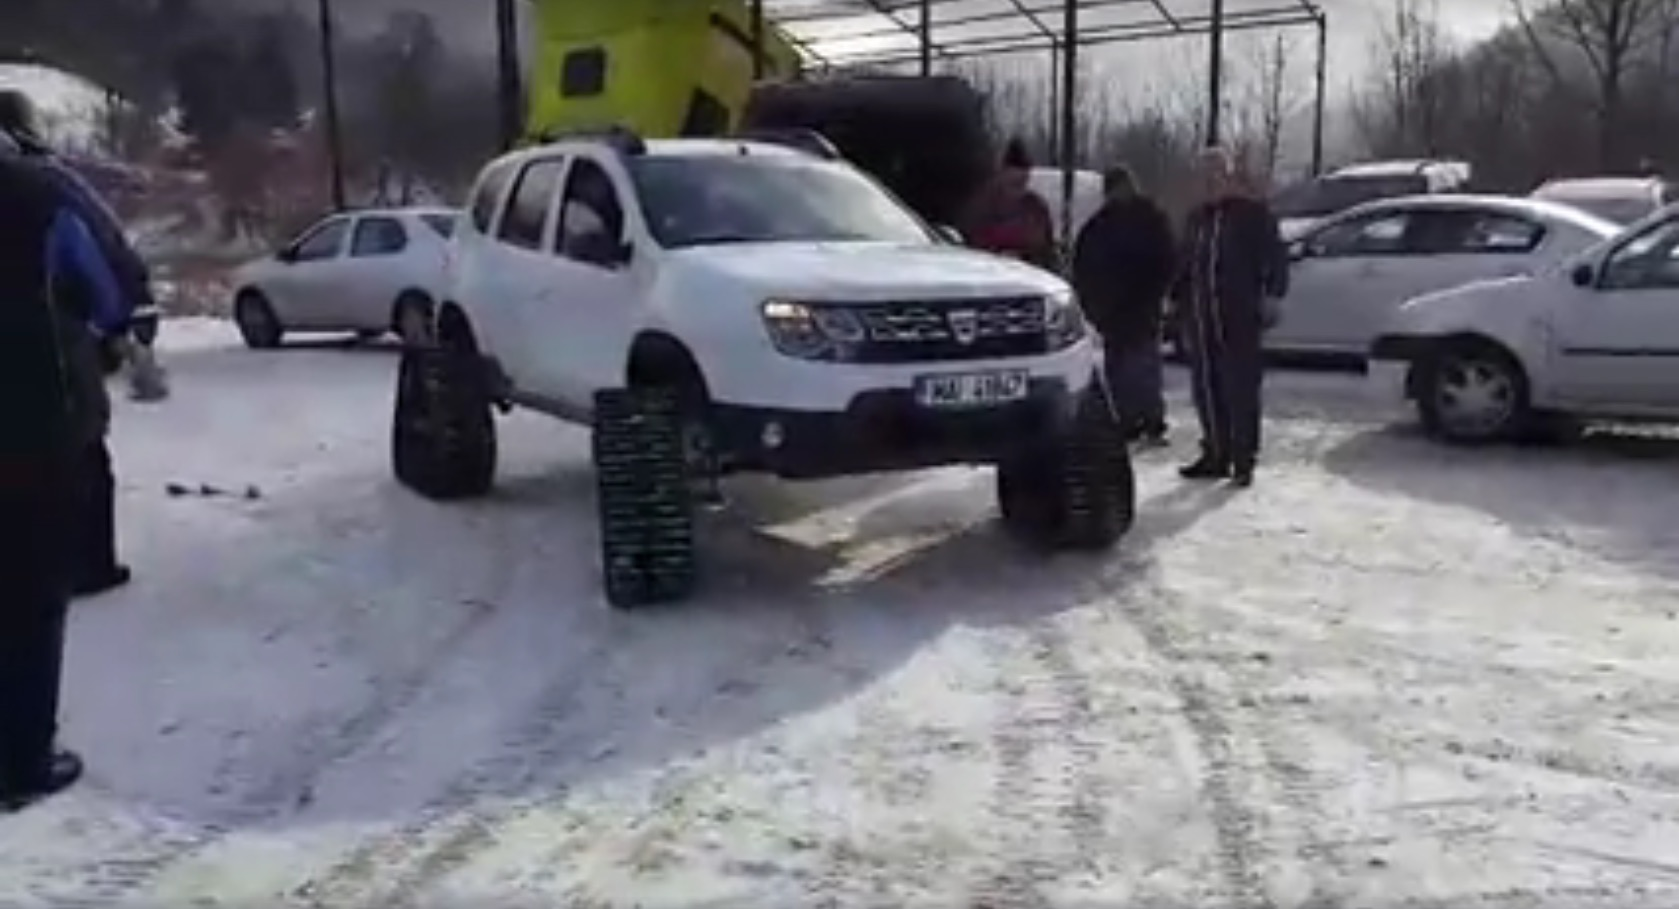 Dacia Duster Gets Custom Triangular Tracks For Wheels